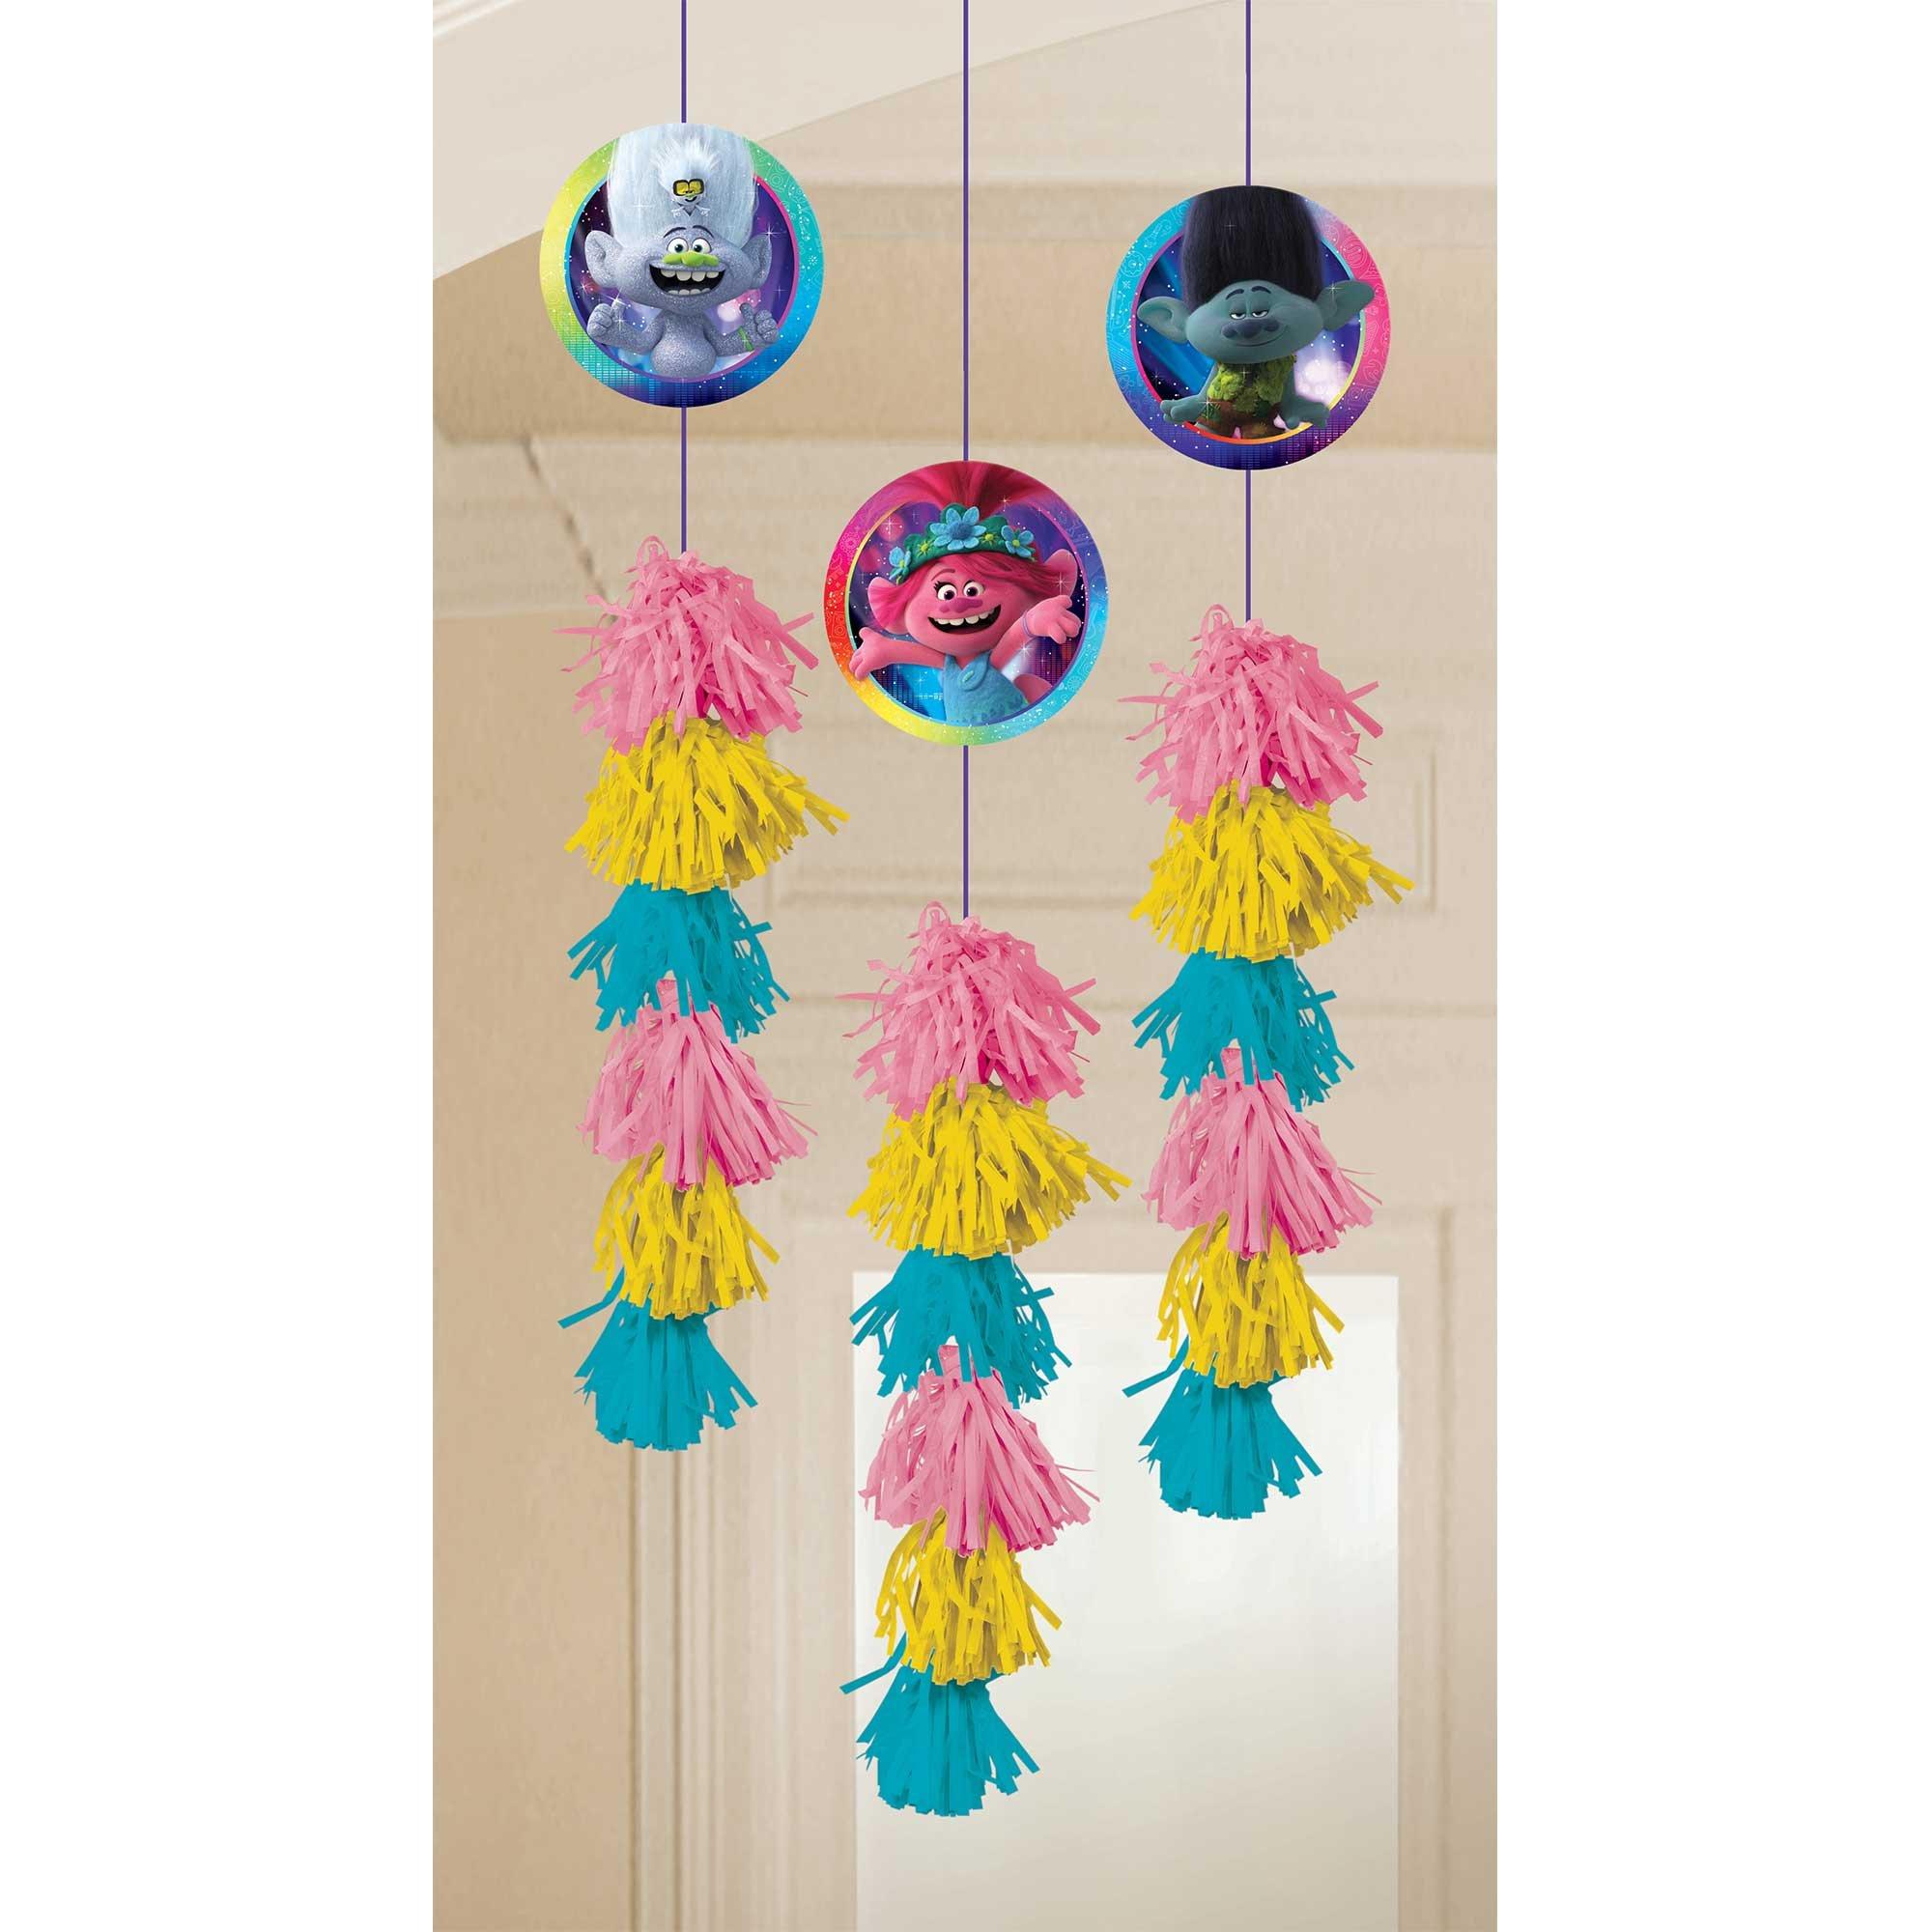 Trolls World Tour Hanging Dangle Decorations